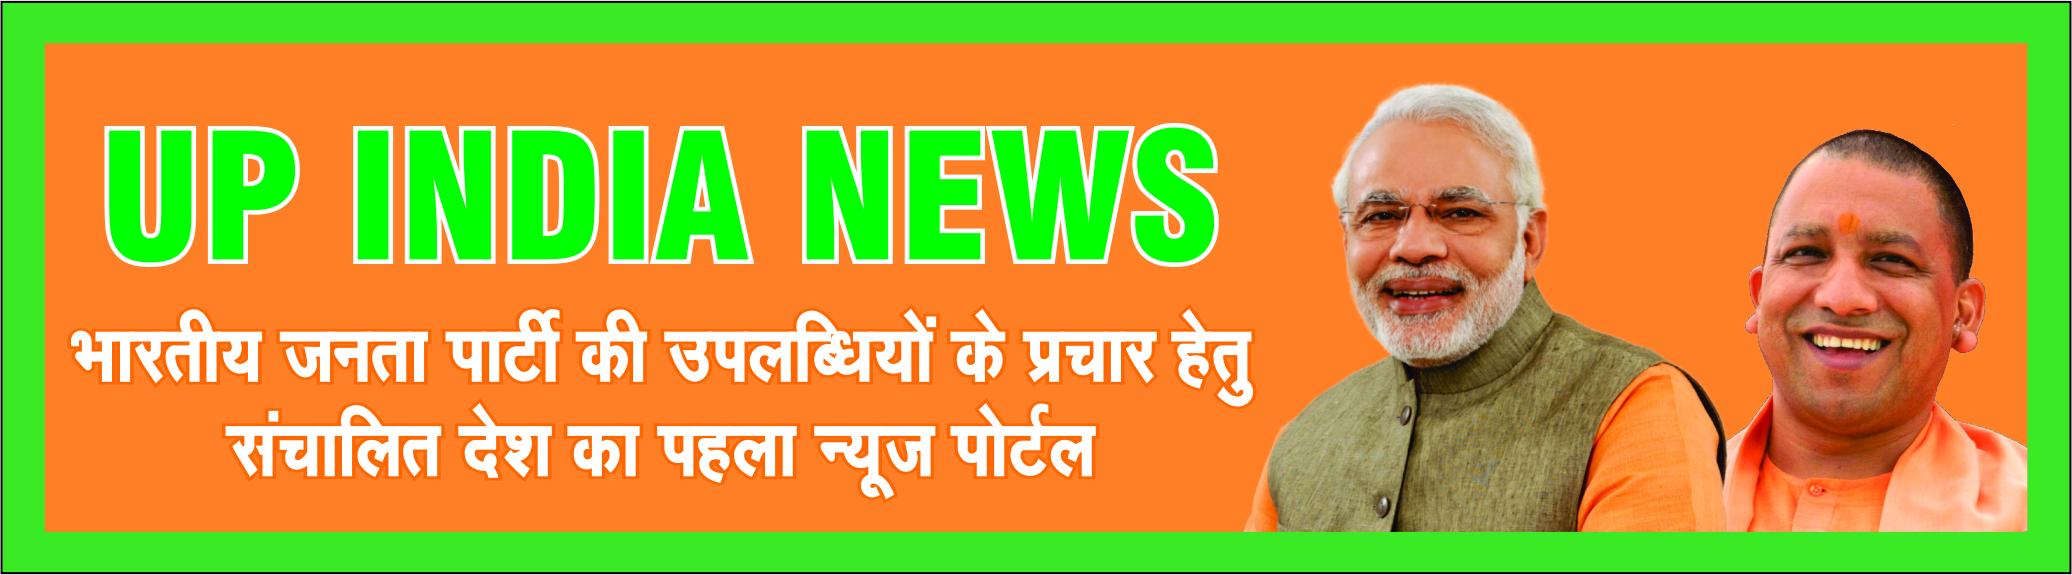 UpIndiaNews - News Portal